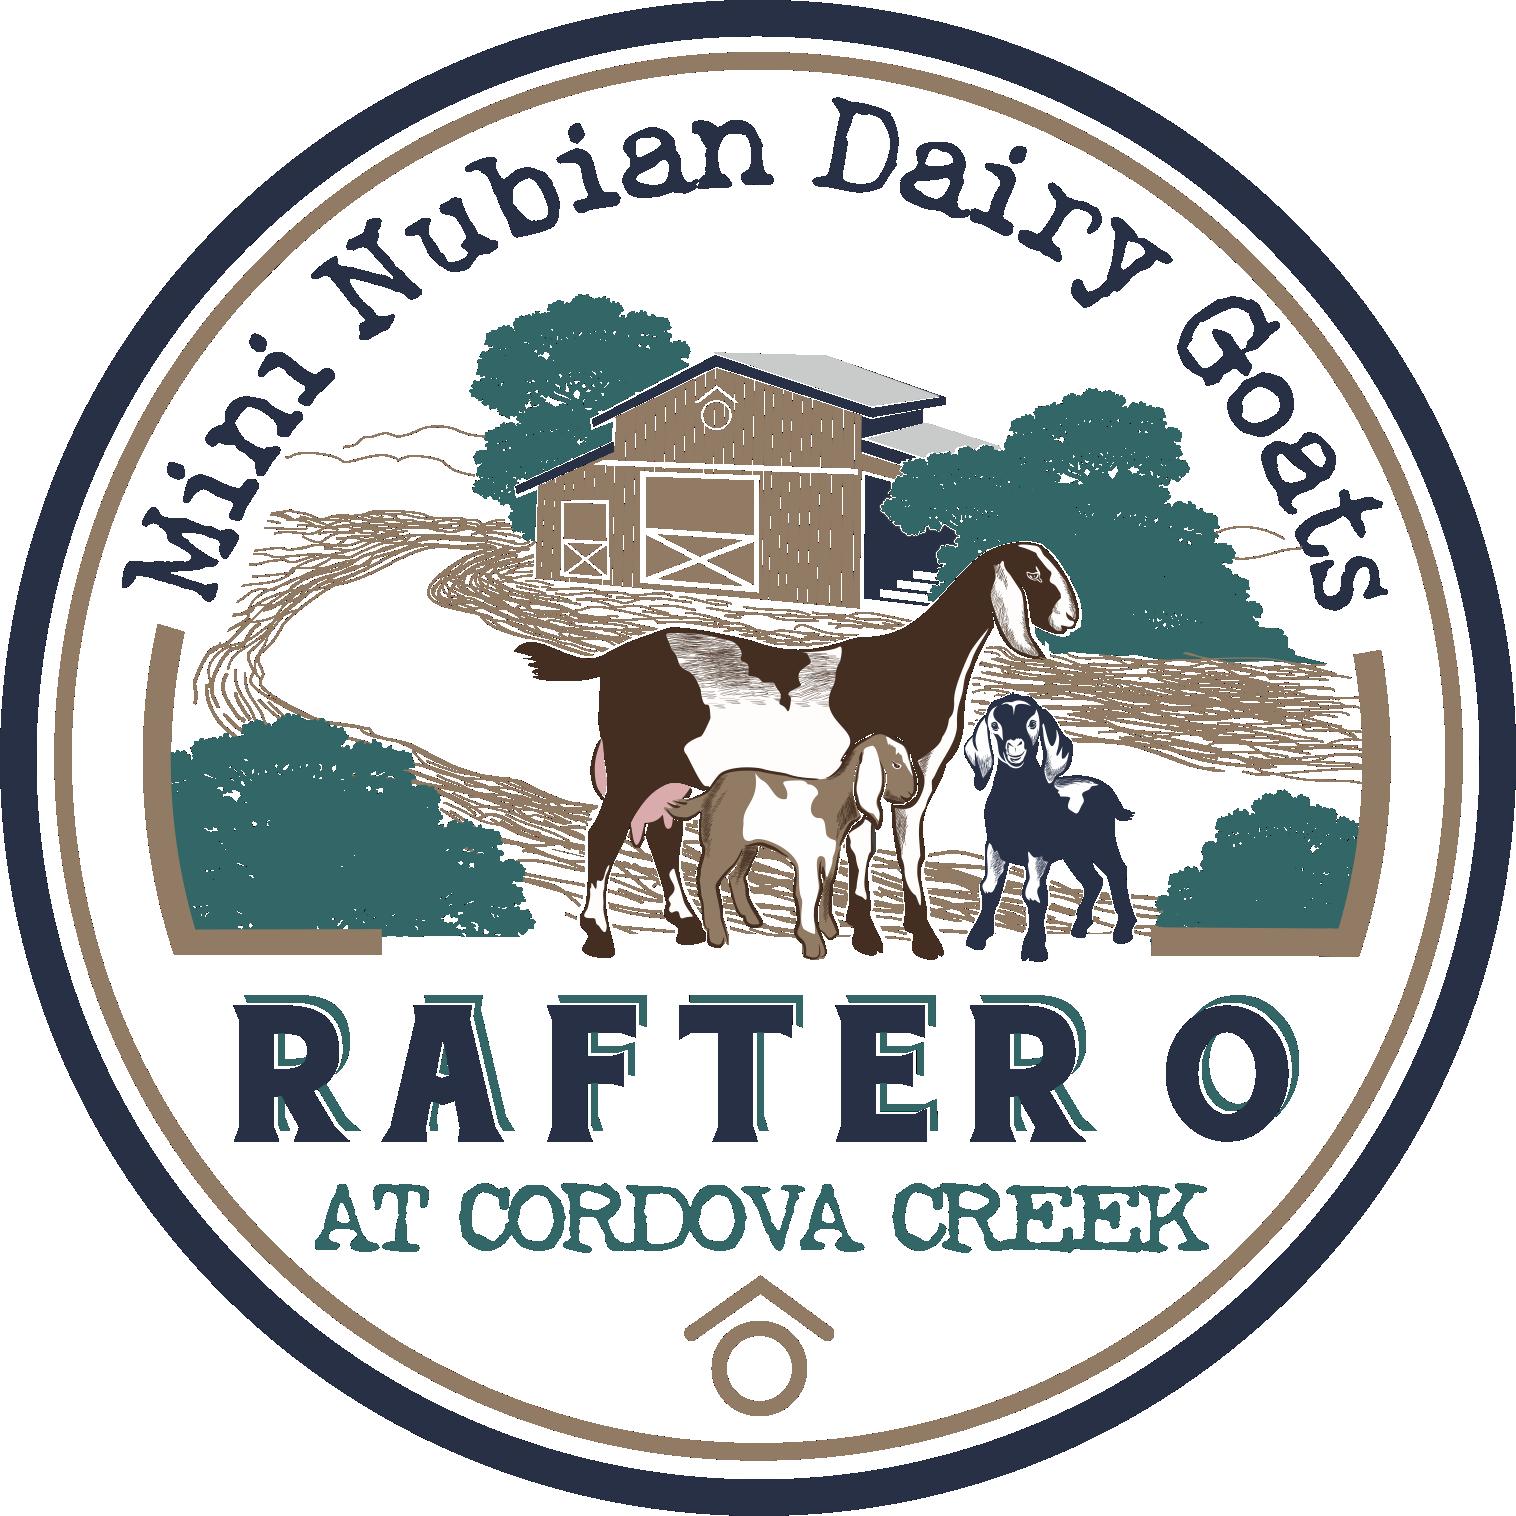 Goat farm needs new FUN AND FRESH logo